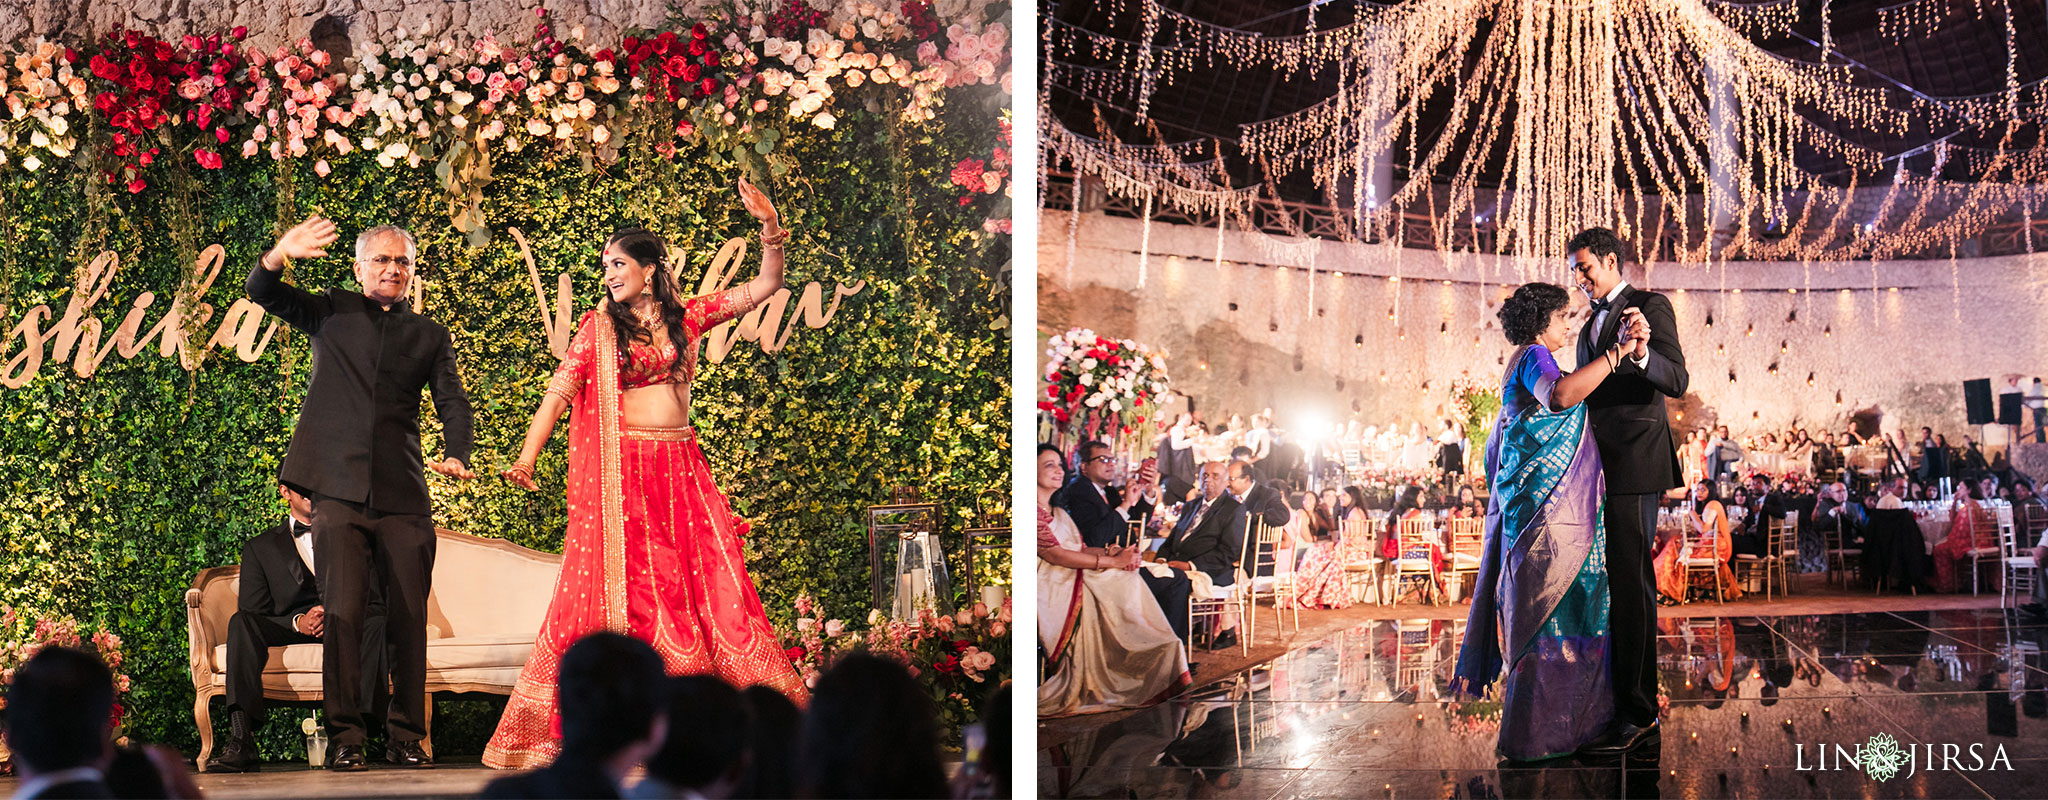 60 Grand Hyatt Playa del Carmen Cancun Mexico Indian Wedding Photography